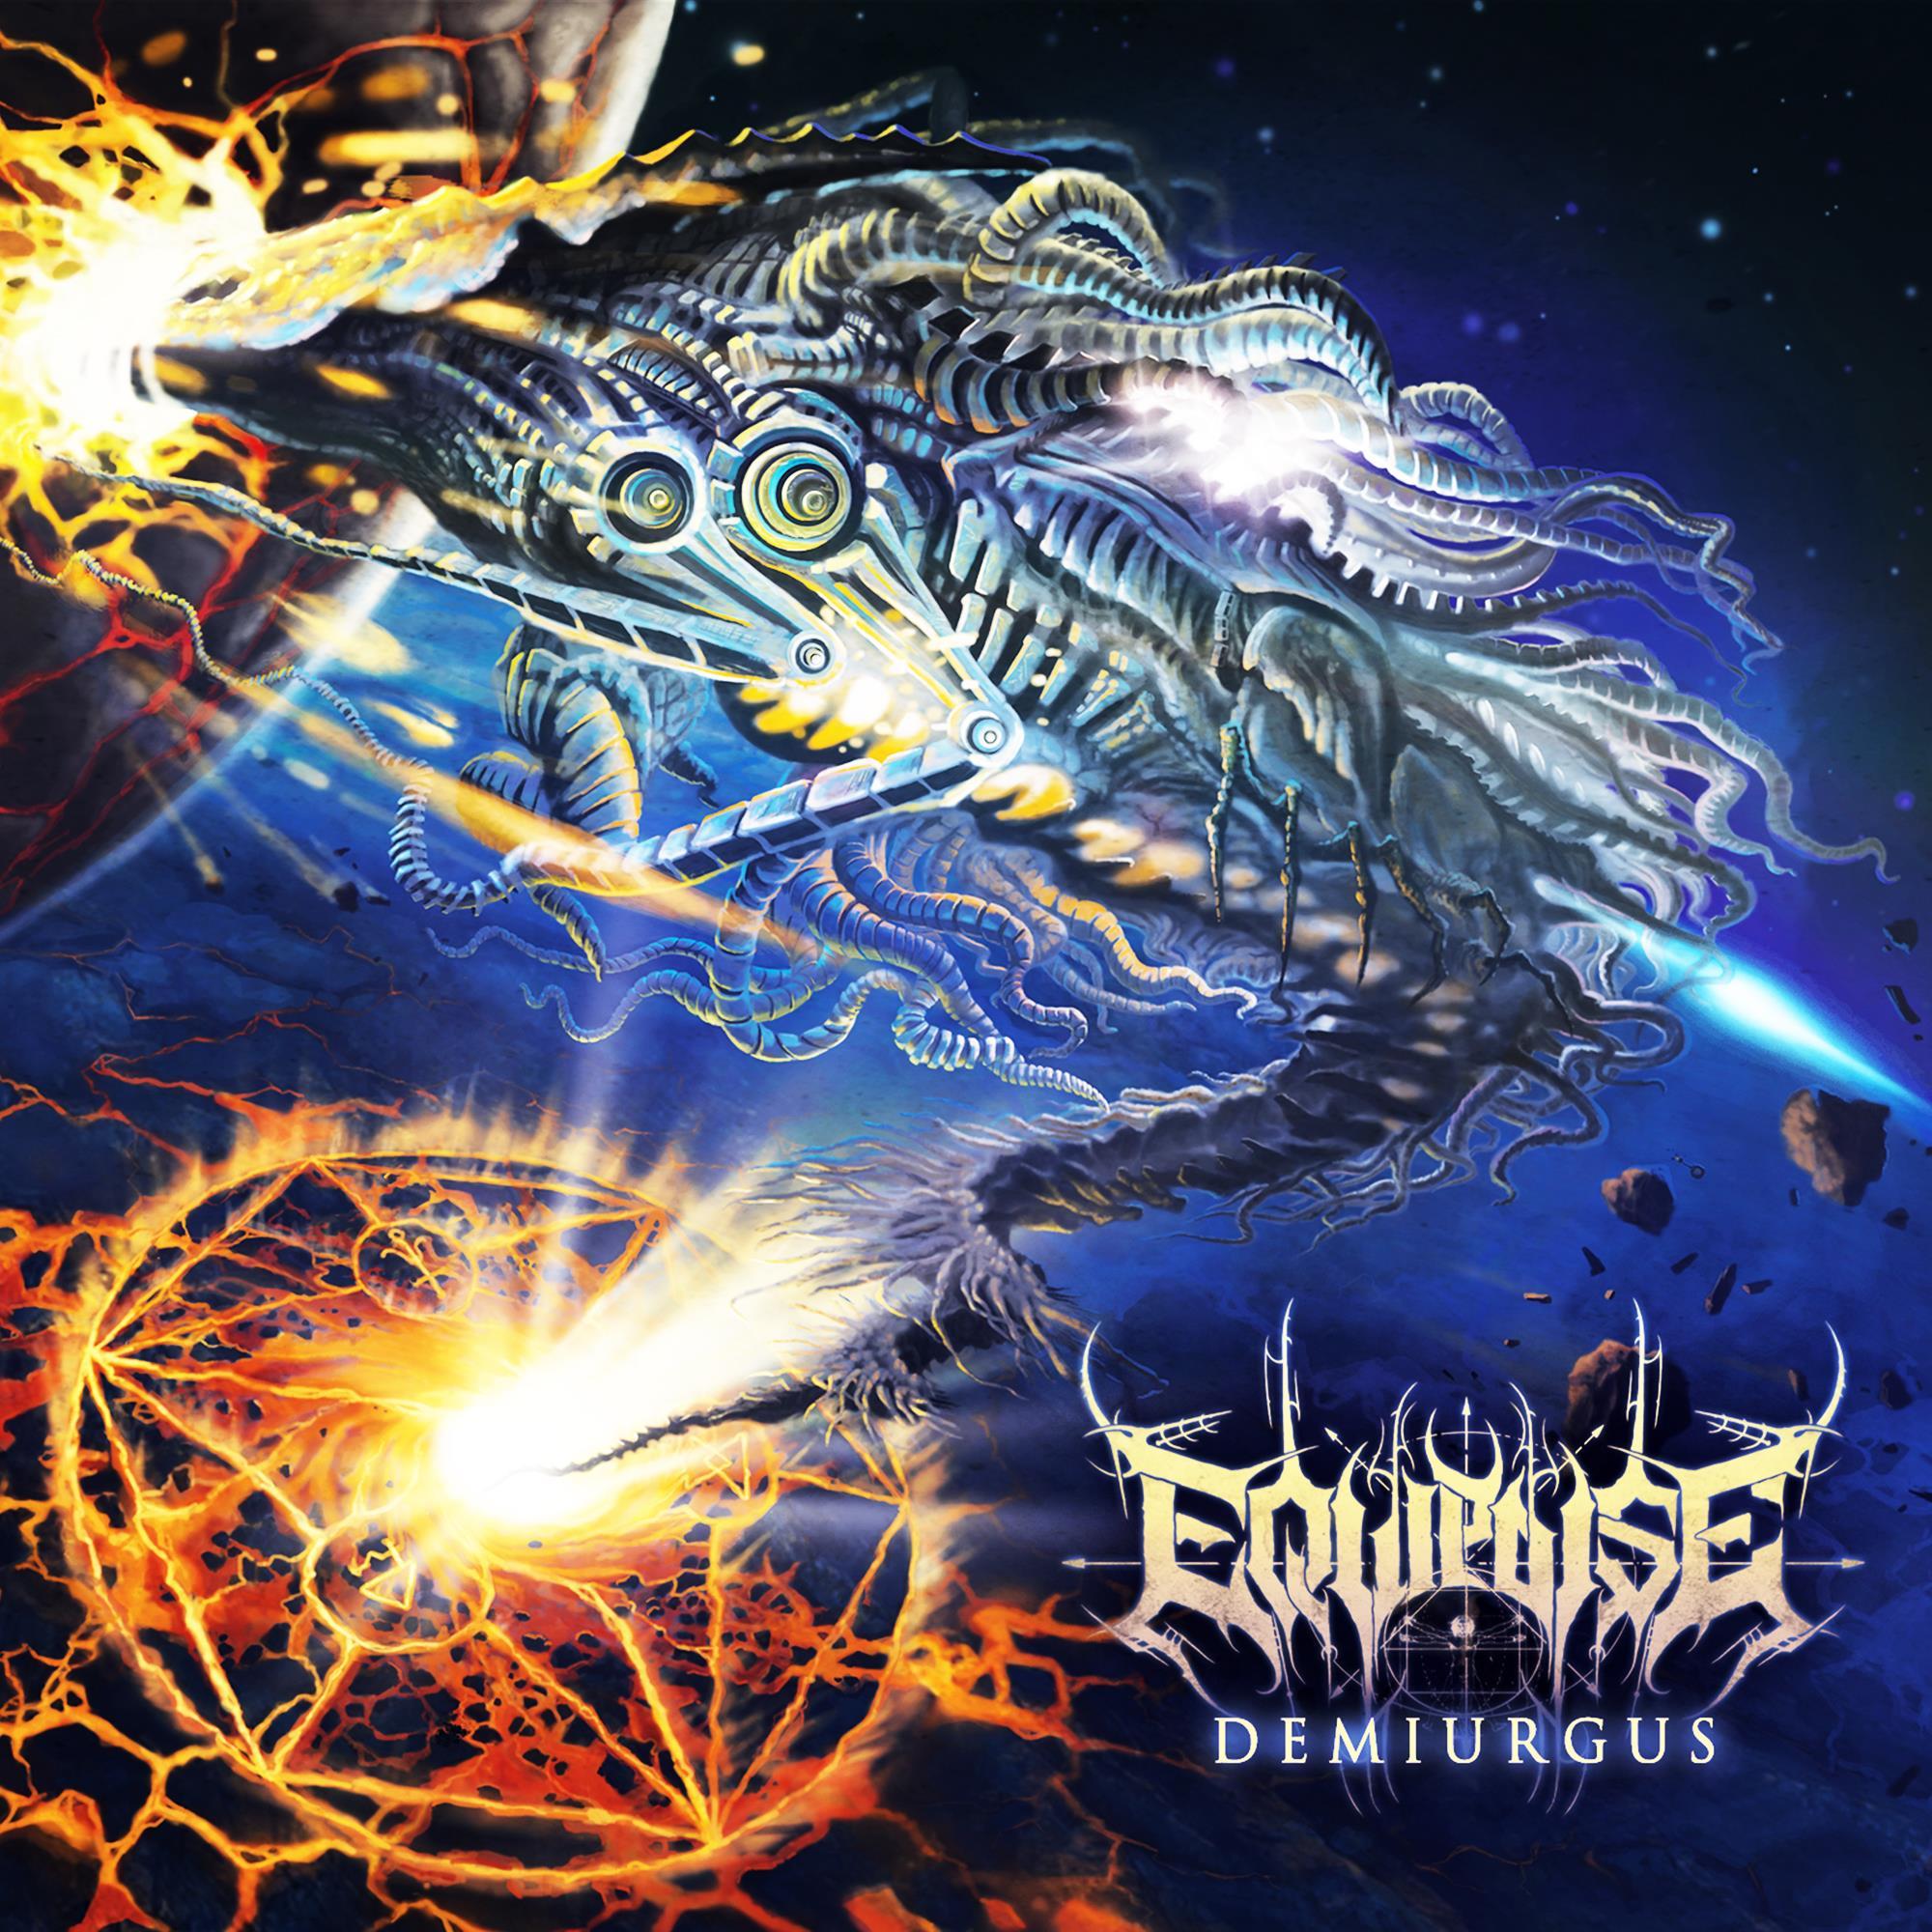 Demiurgus Vinyl